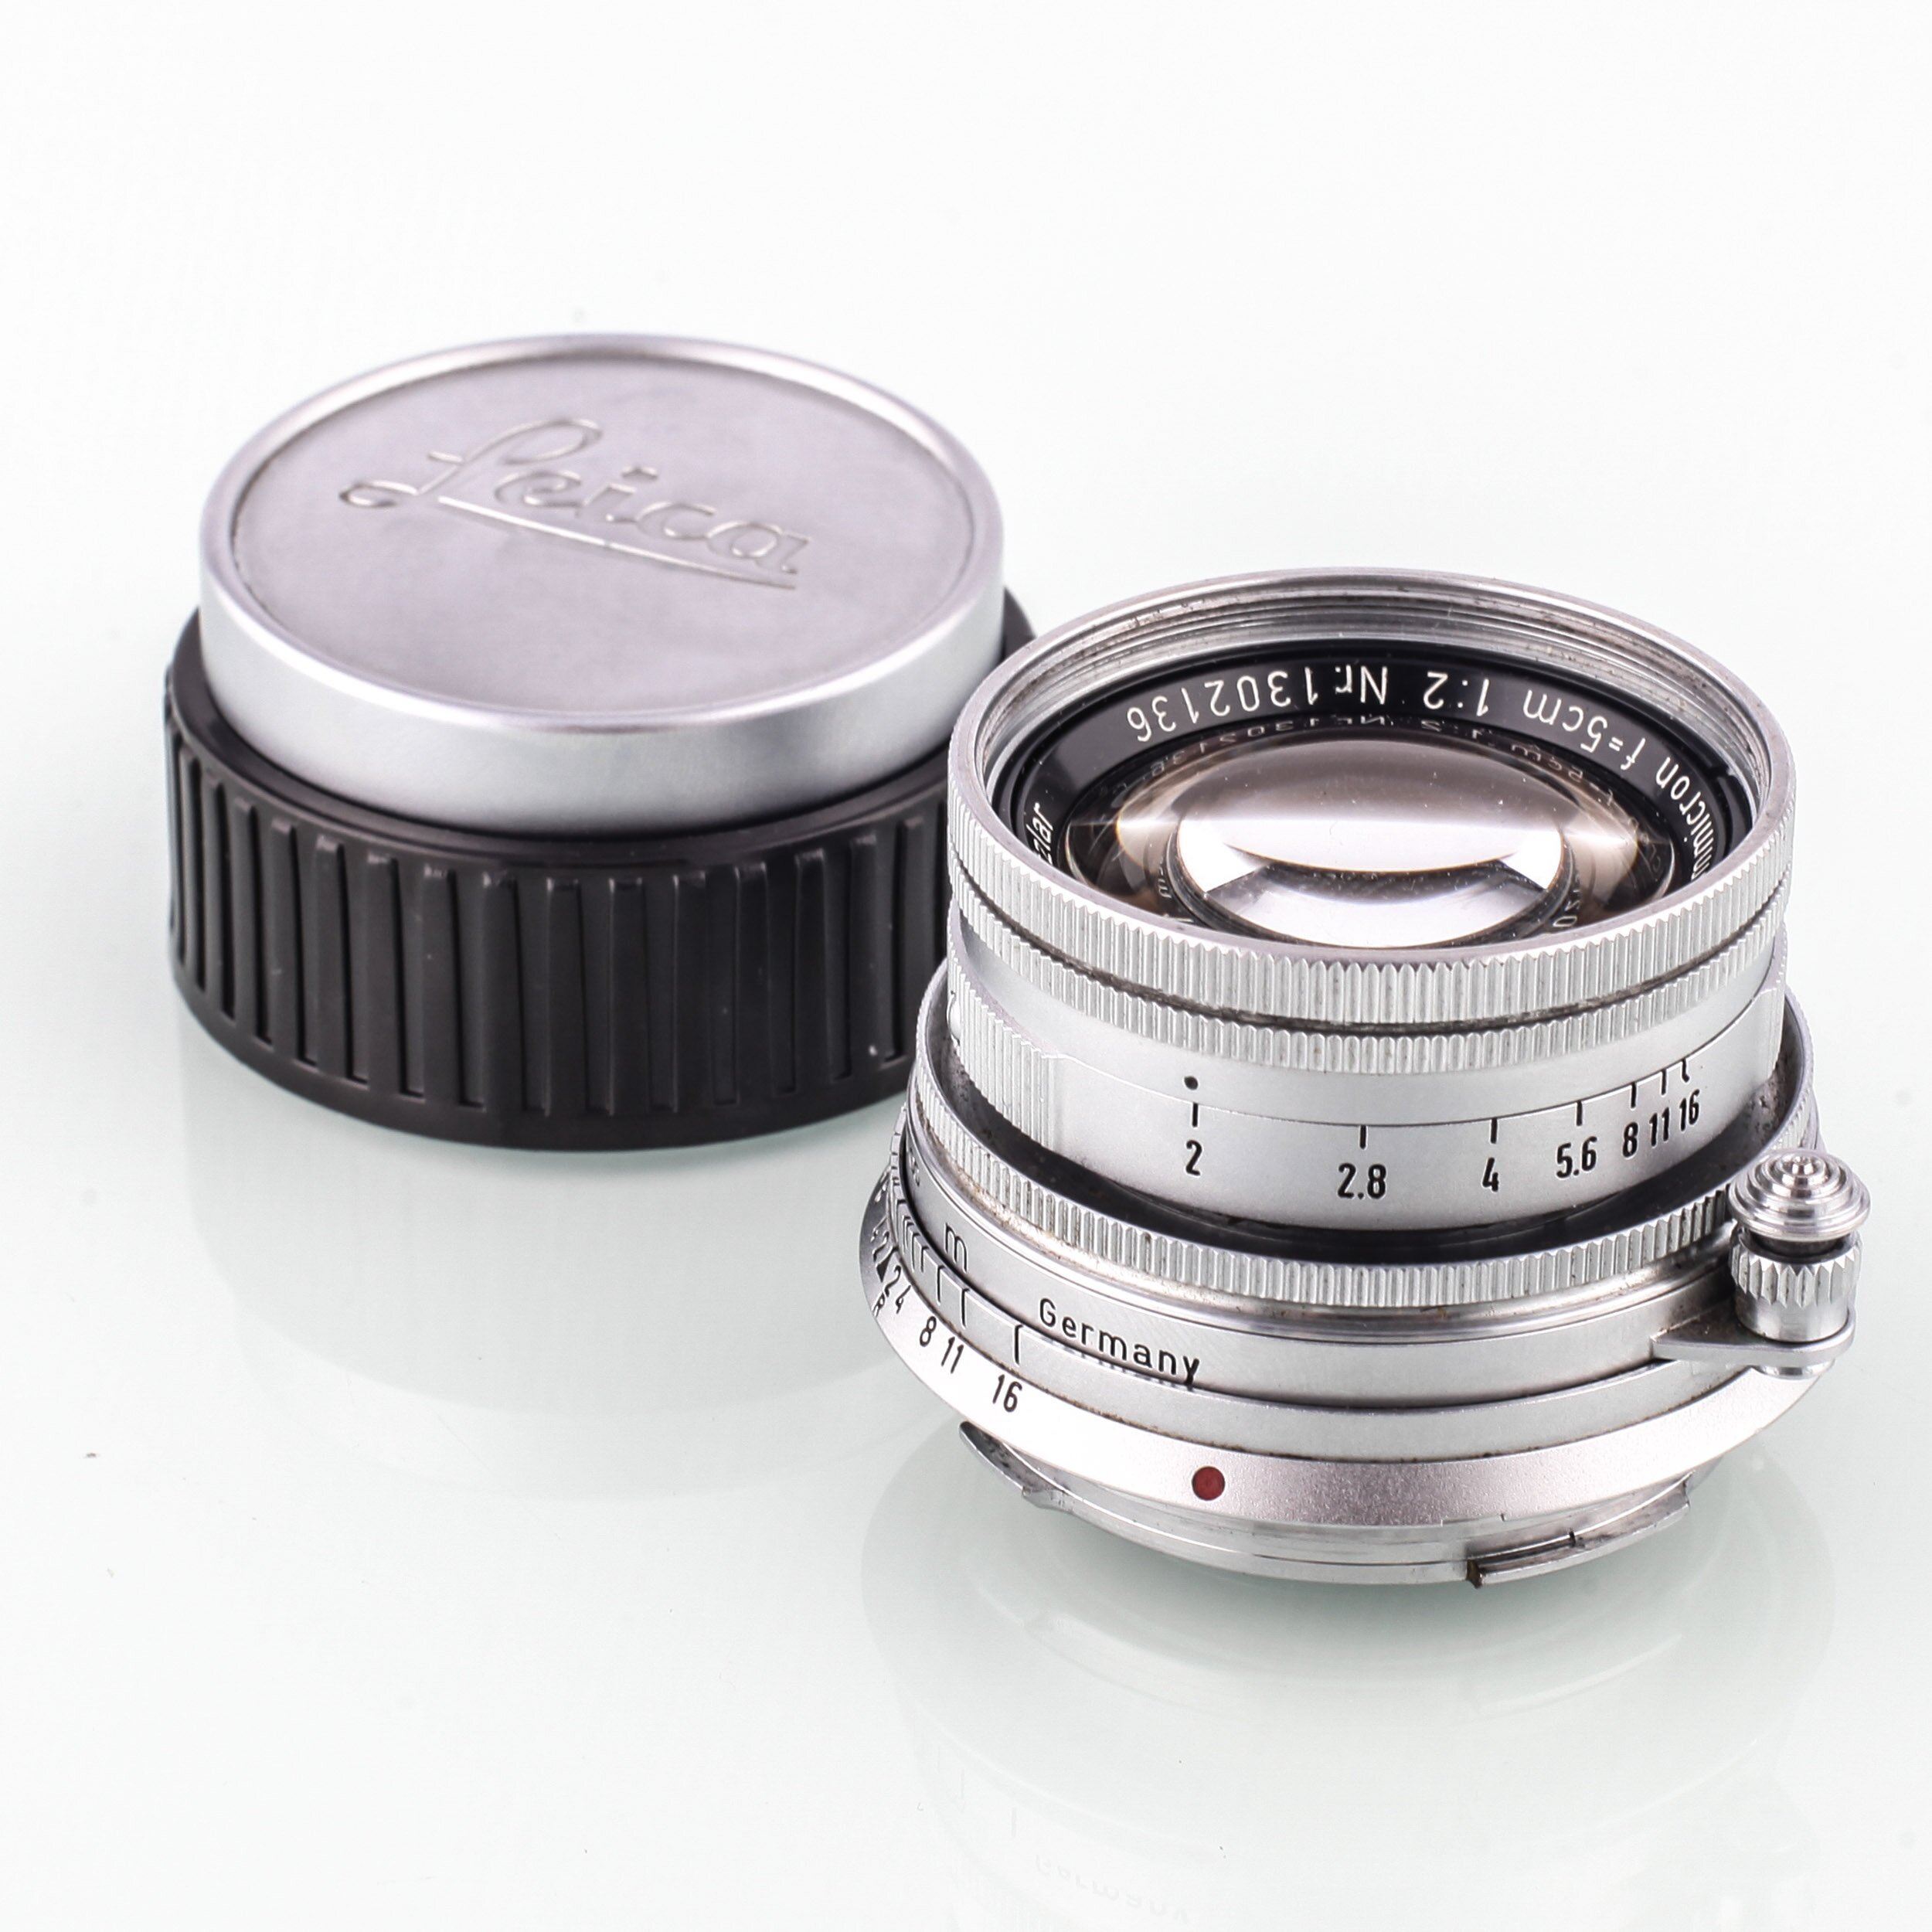 Leica M Summicron 5cm F2 versenkbar 10 blenden